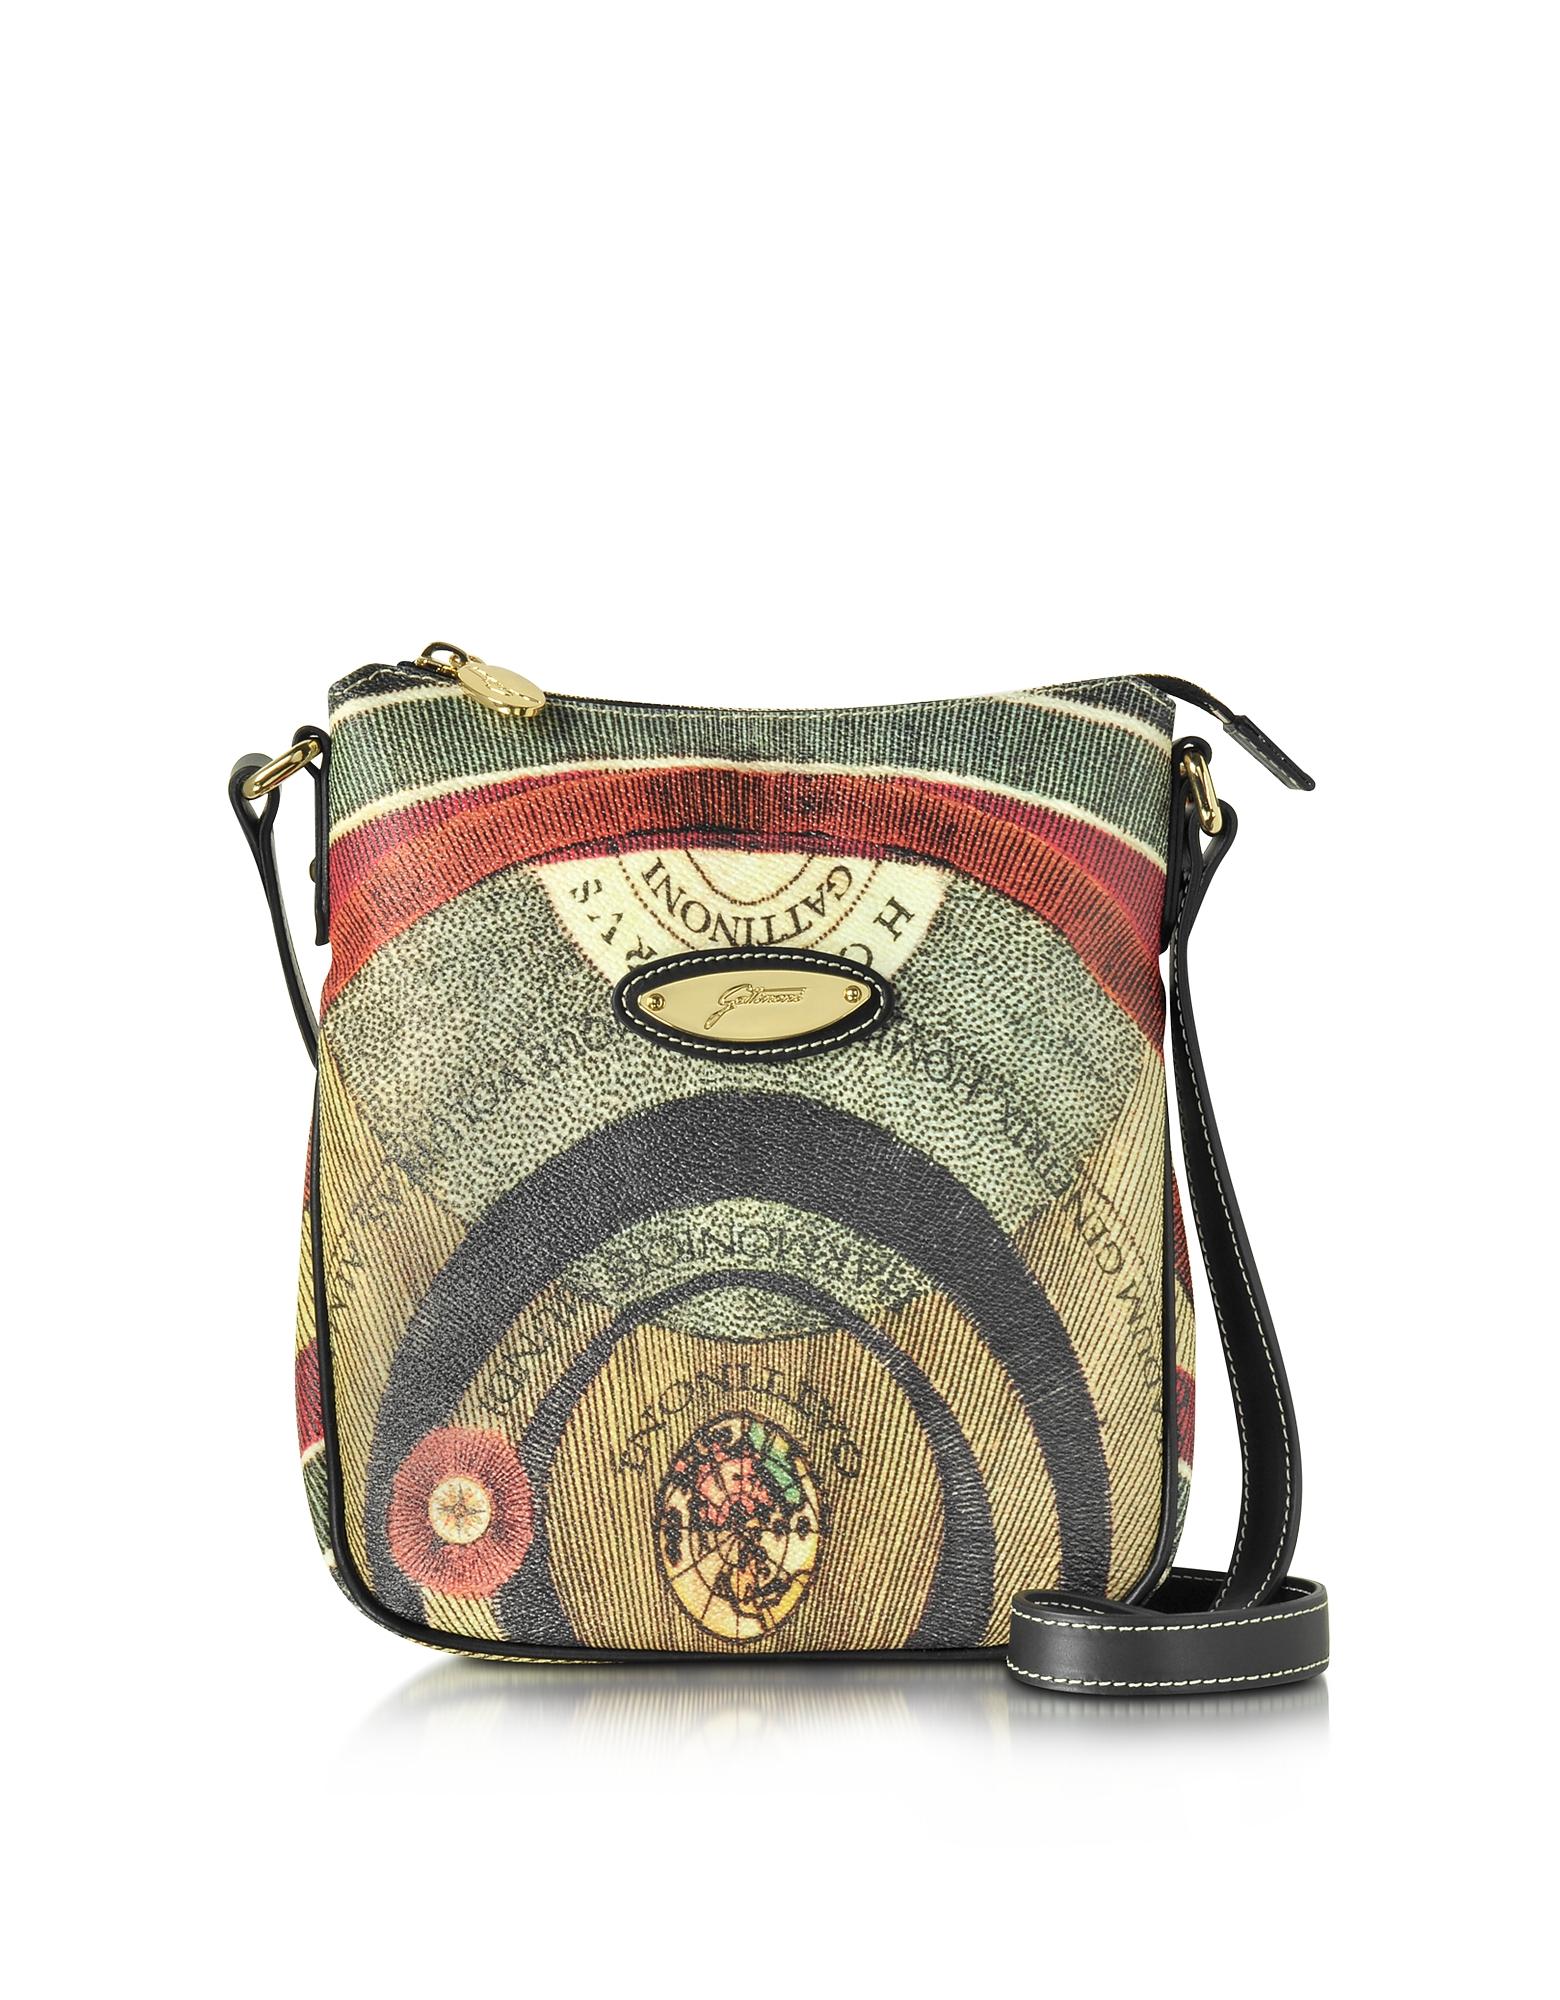 Gattinoni Handbags, Planetarium Coated Canvas and Leather Crossbody Bag